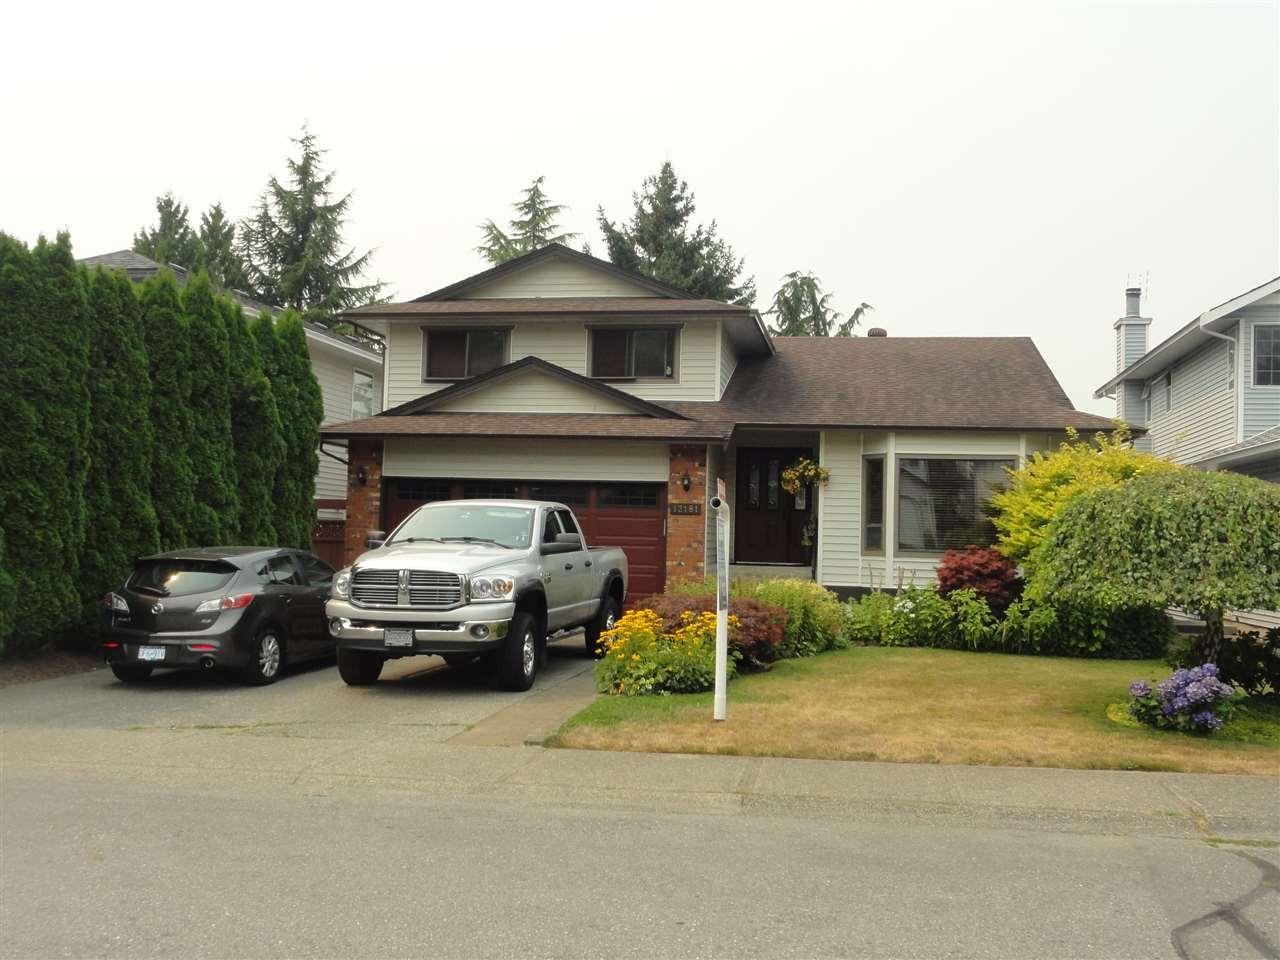 Detached at 12181 MAKINSON STREET, Maple Ridge, British Columbia. Image 1